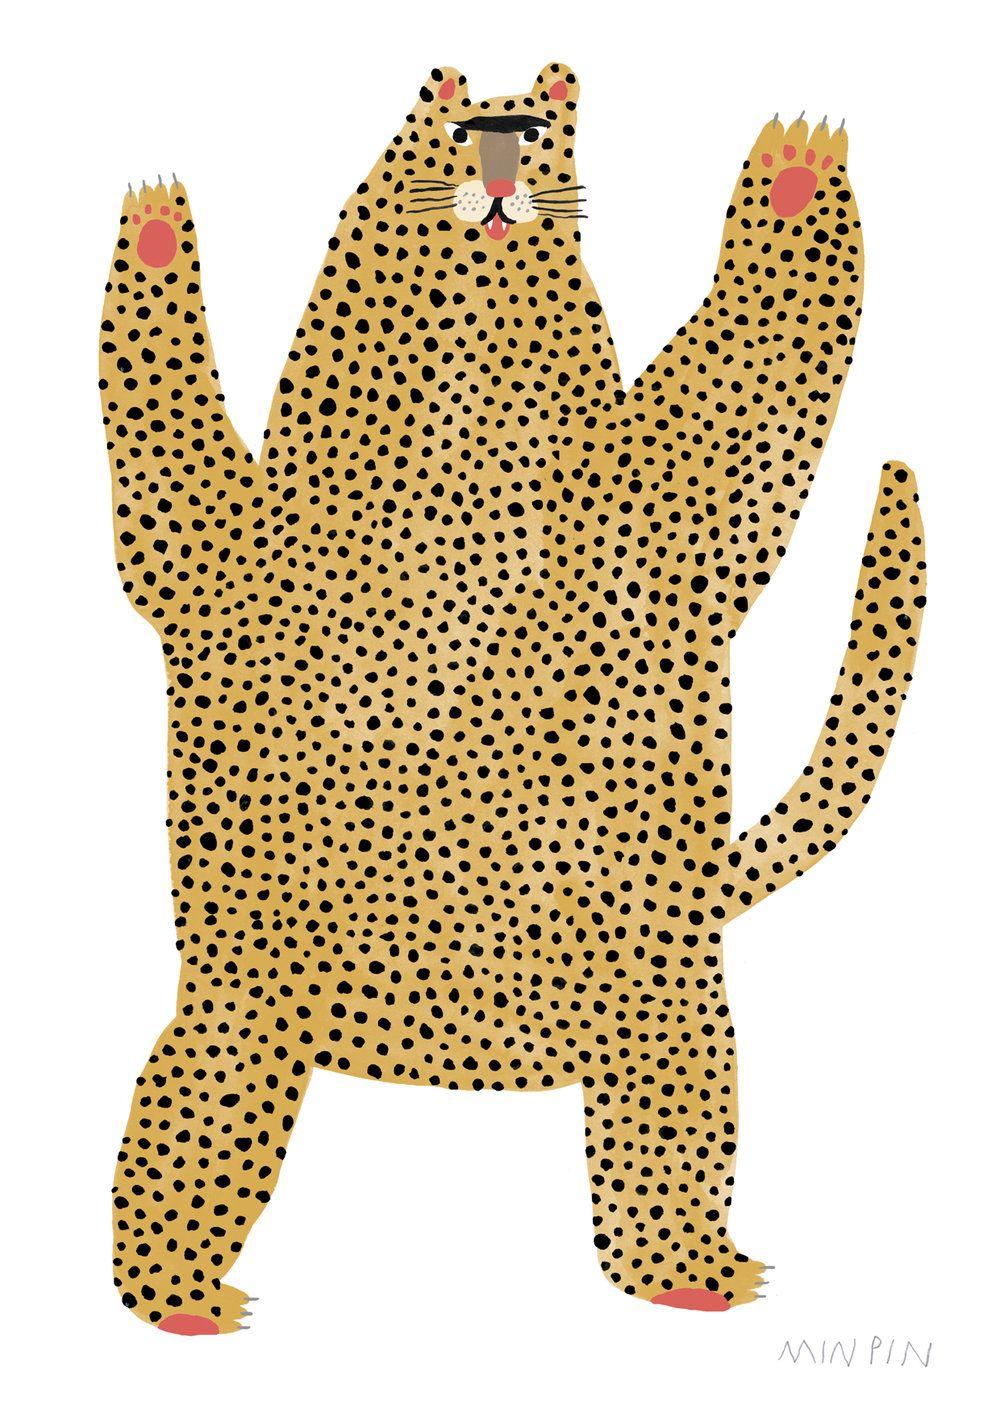 Grrra6rgb Jpg Illustration Animal Illustration Animal Art